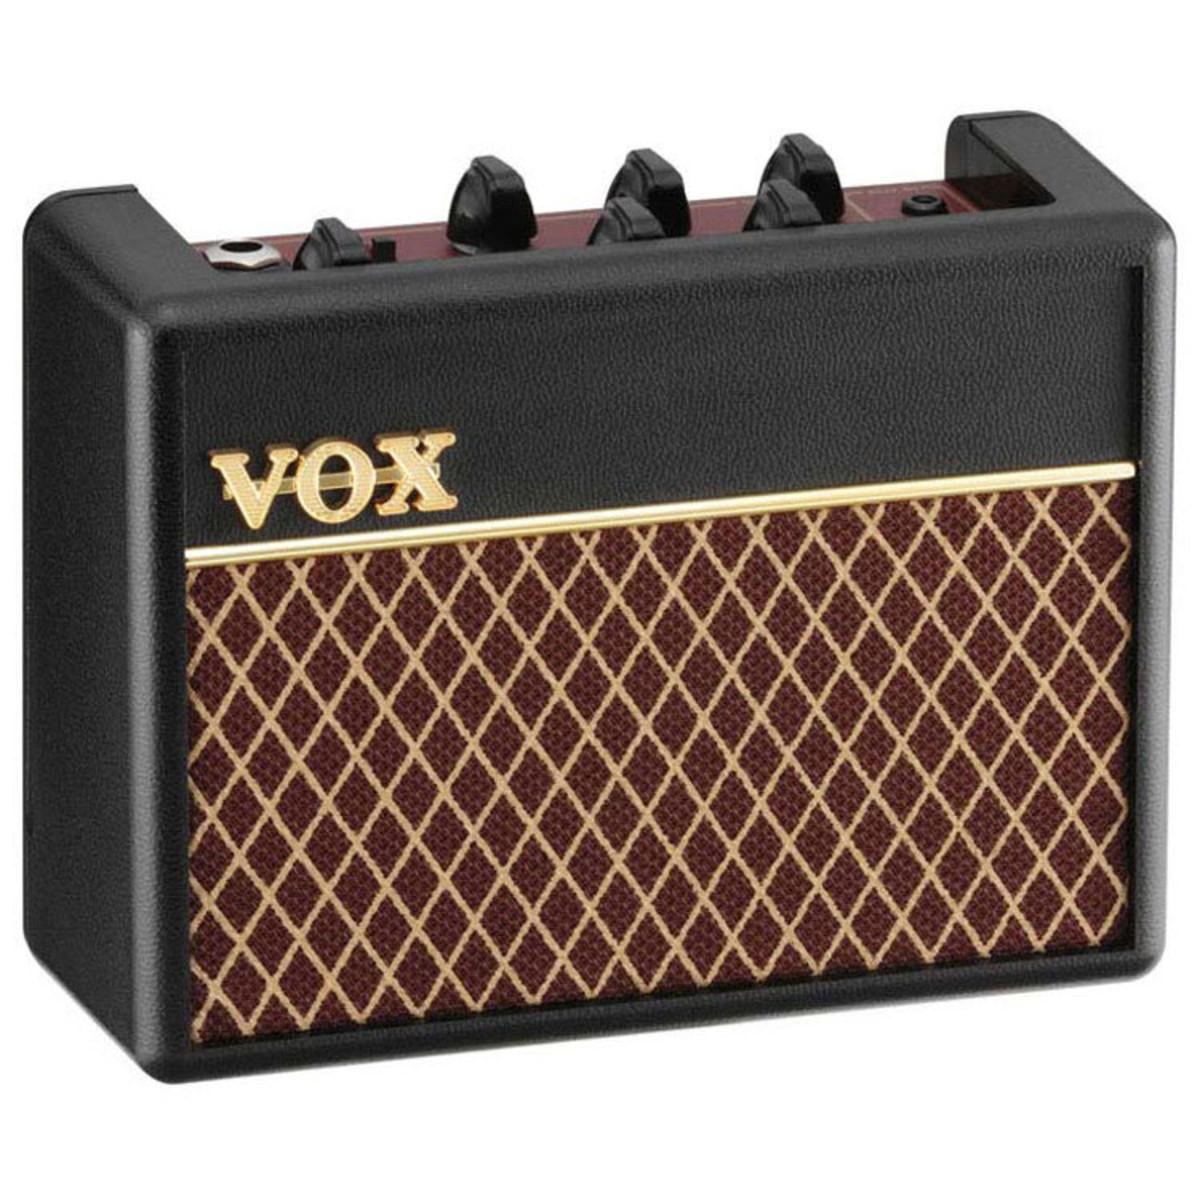 Vox AC1 Rhythm Vox, alimentadas por batería Mini Amplificador ...